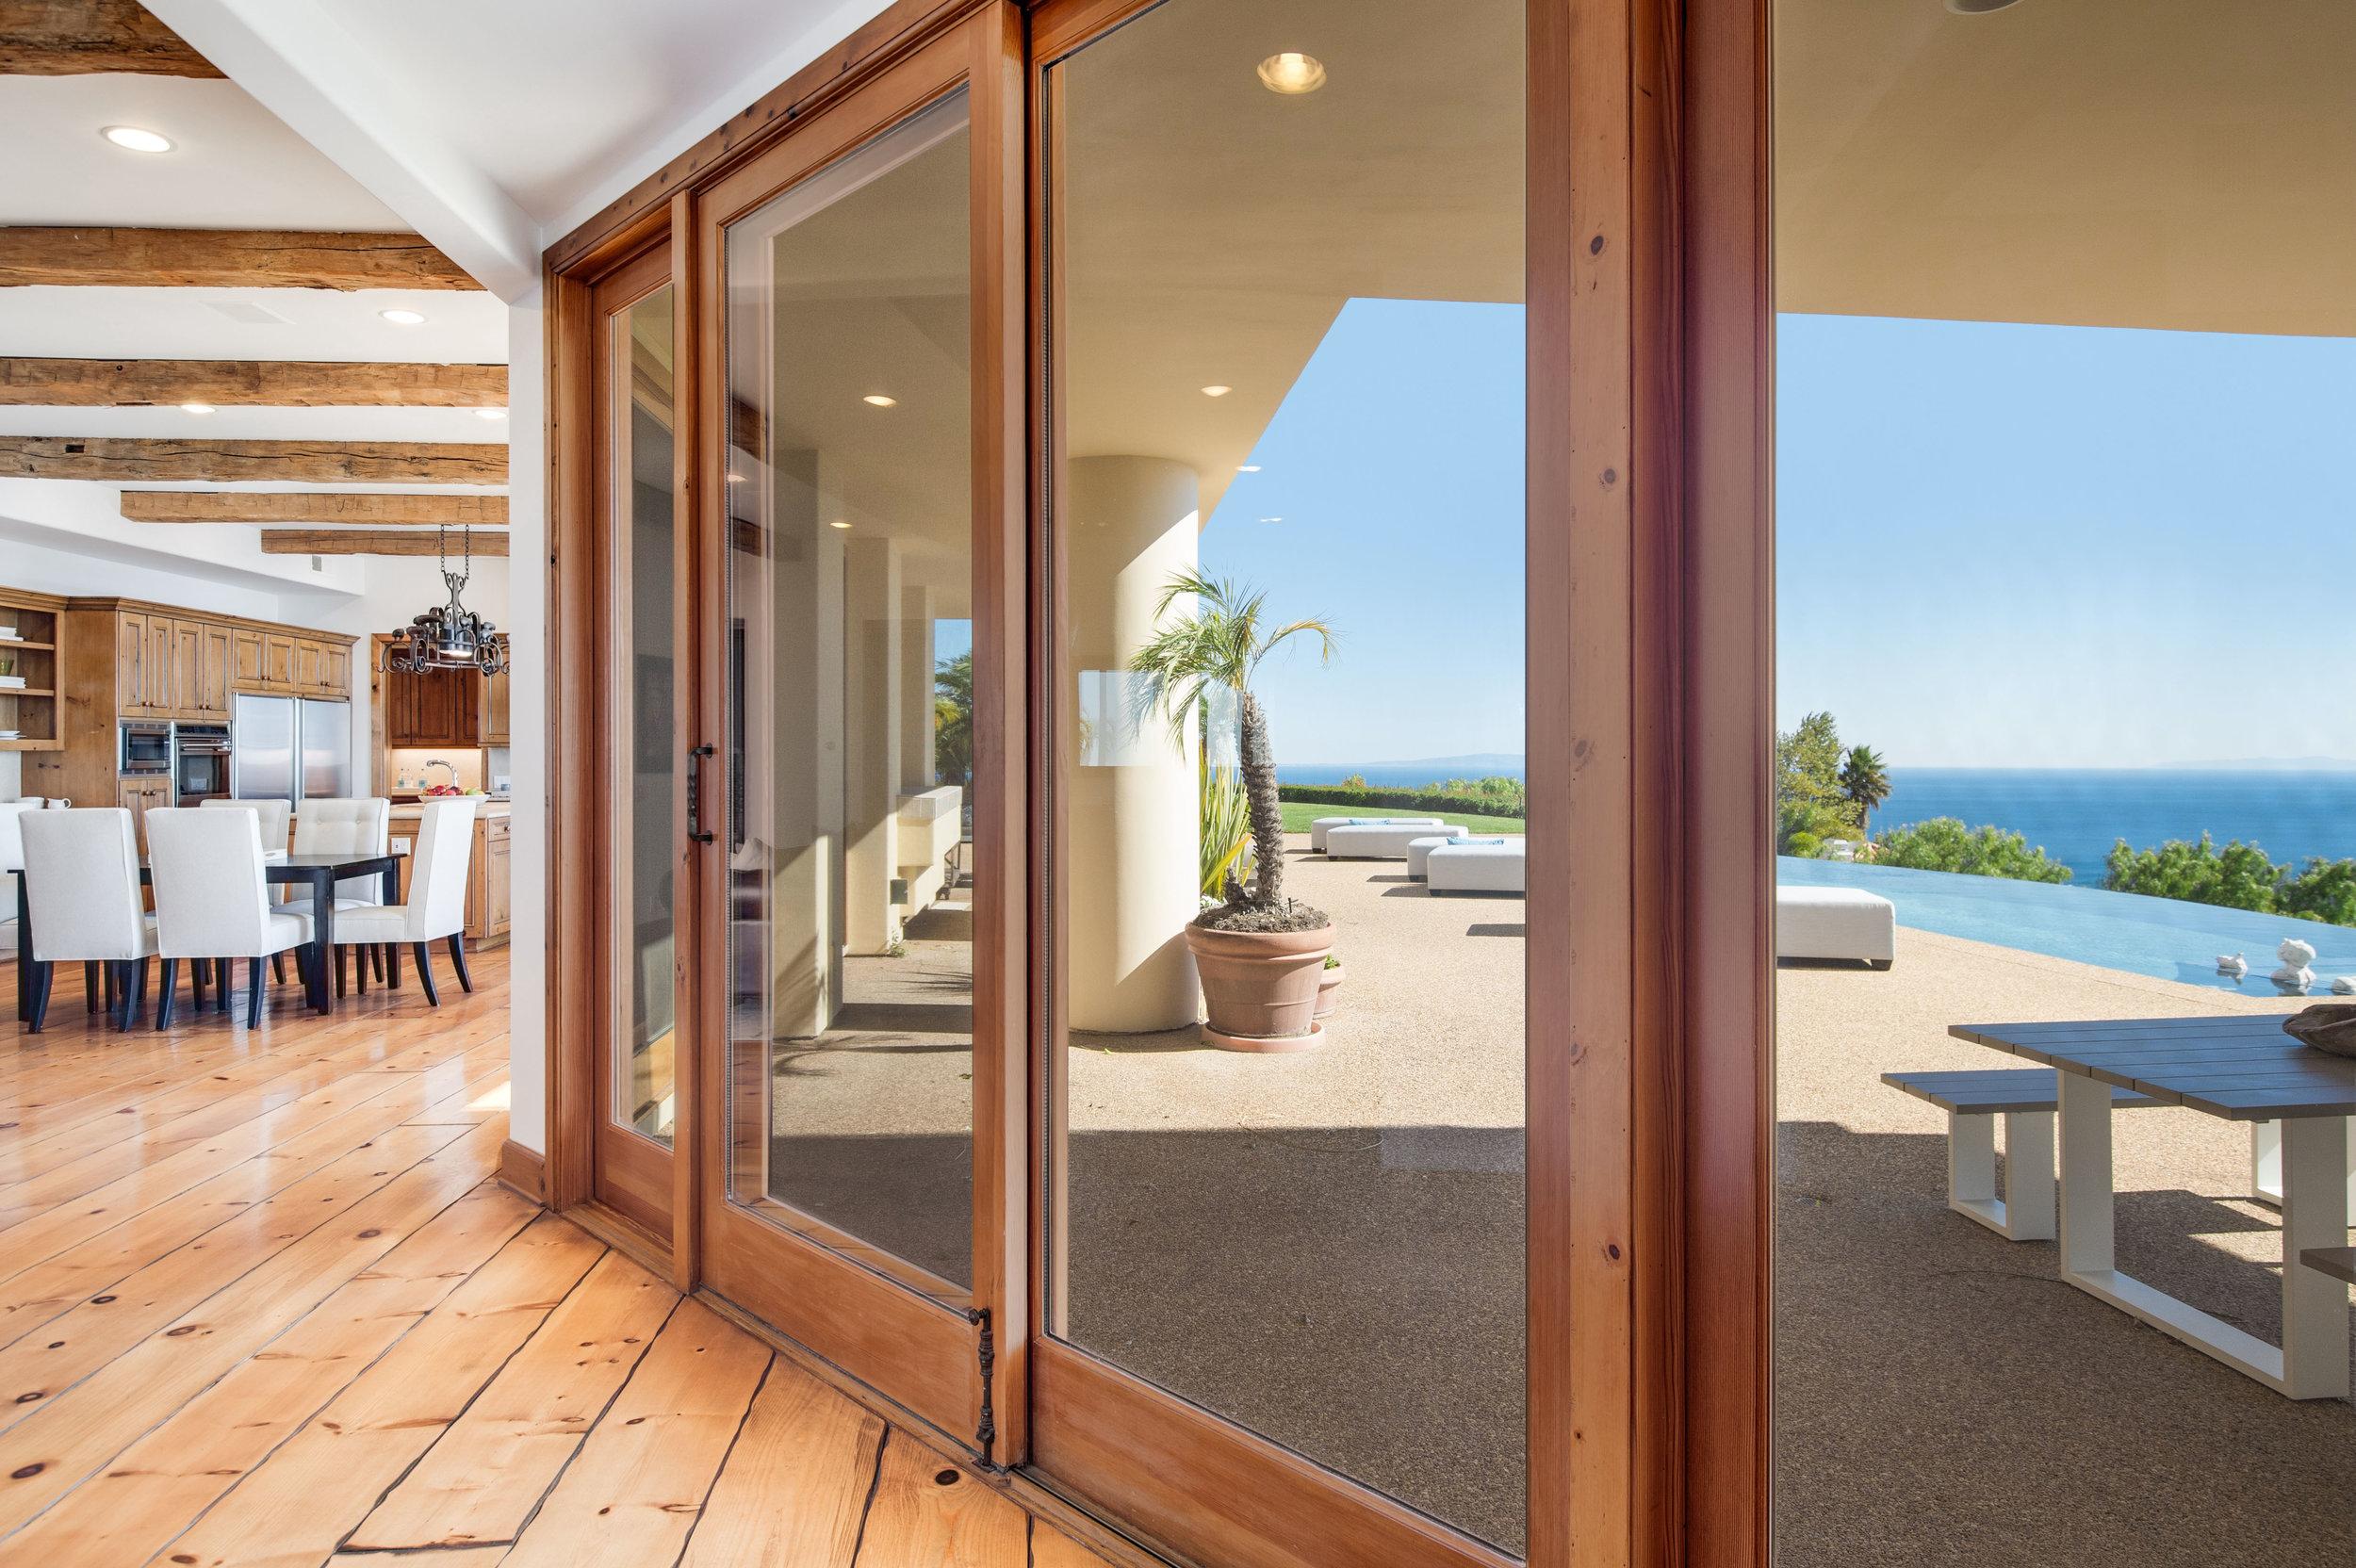 005 Kitchen 27475 Latigo Bay View Drive For Sale Lease The Malibu Life Team Luxury Real Estate.jpg